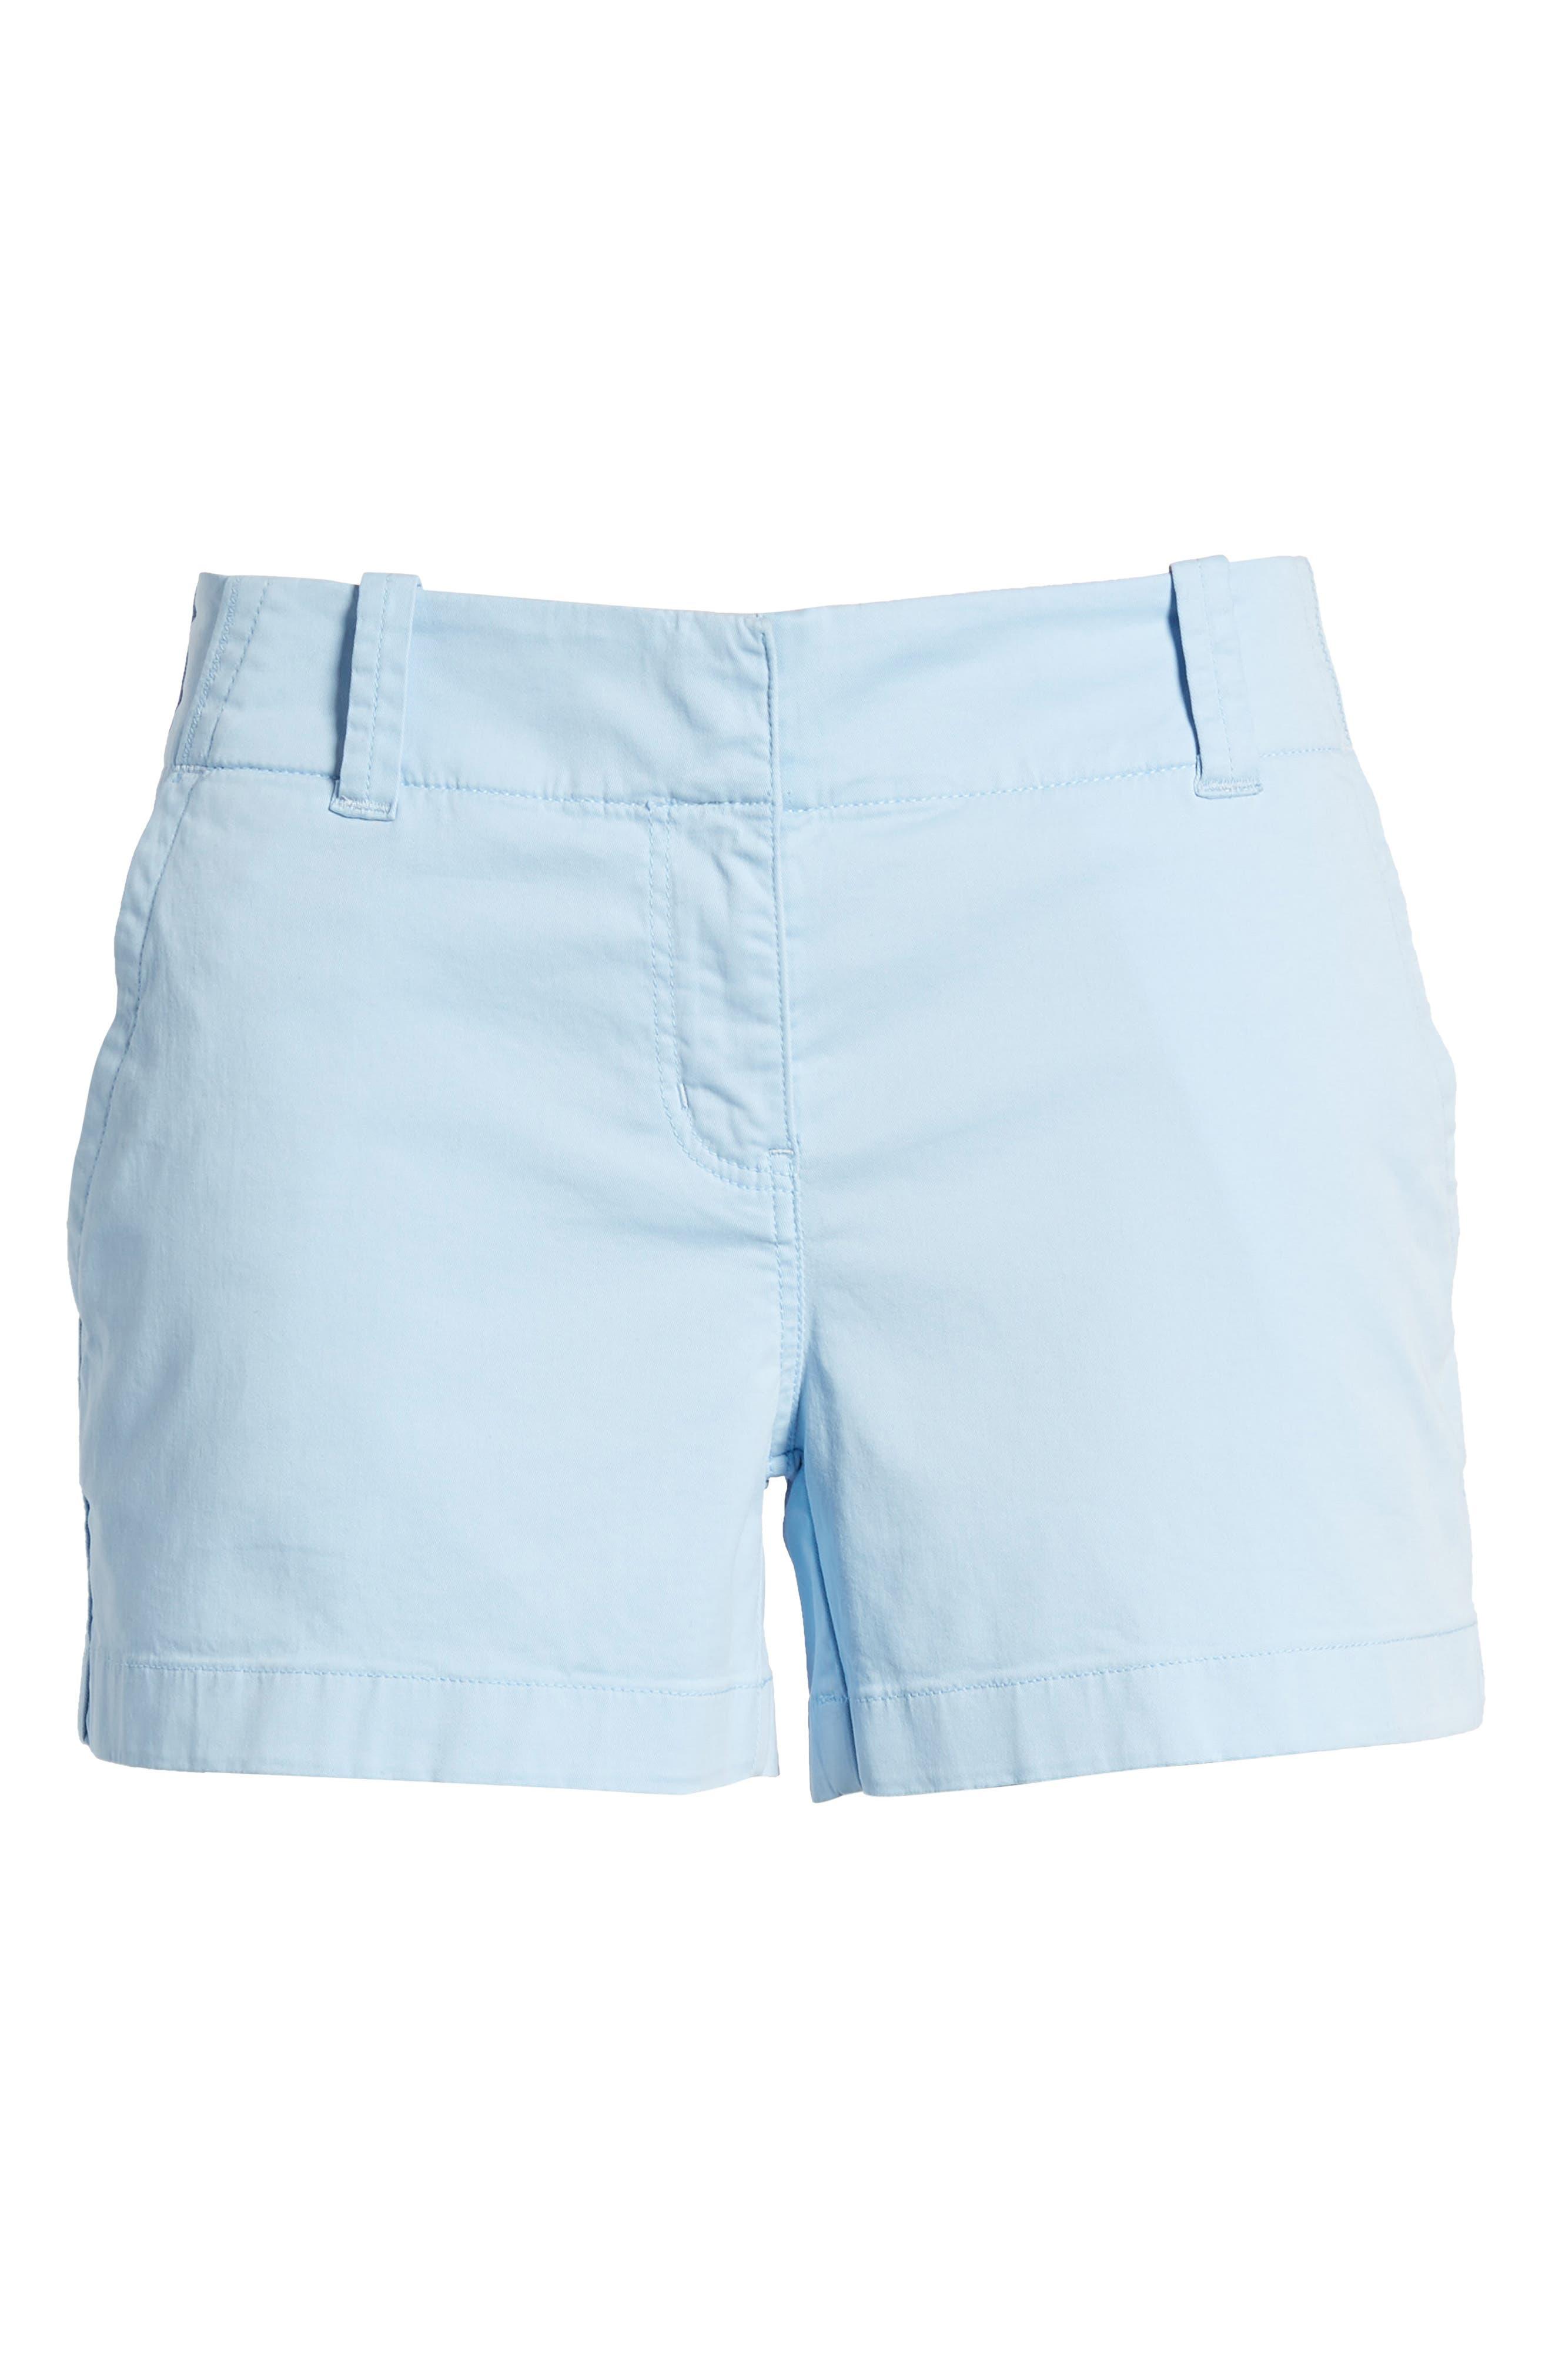 Everyday Stretch Cotton Shorts,                             Alternate thumbnail 6, color,                             Jake Blue